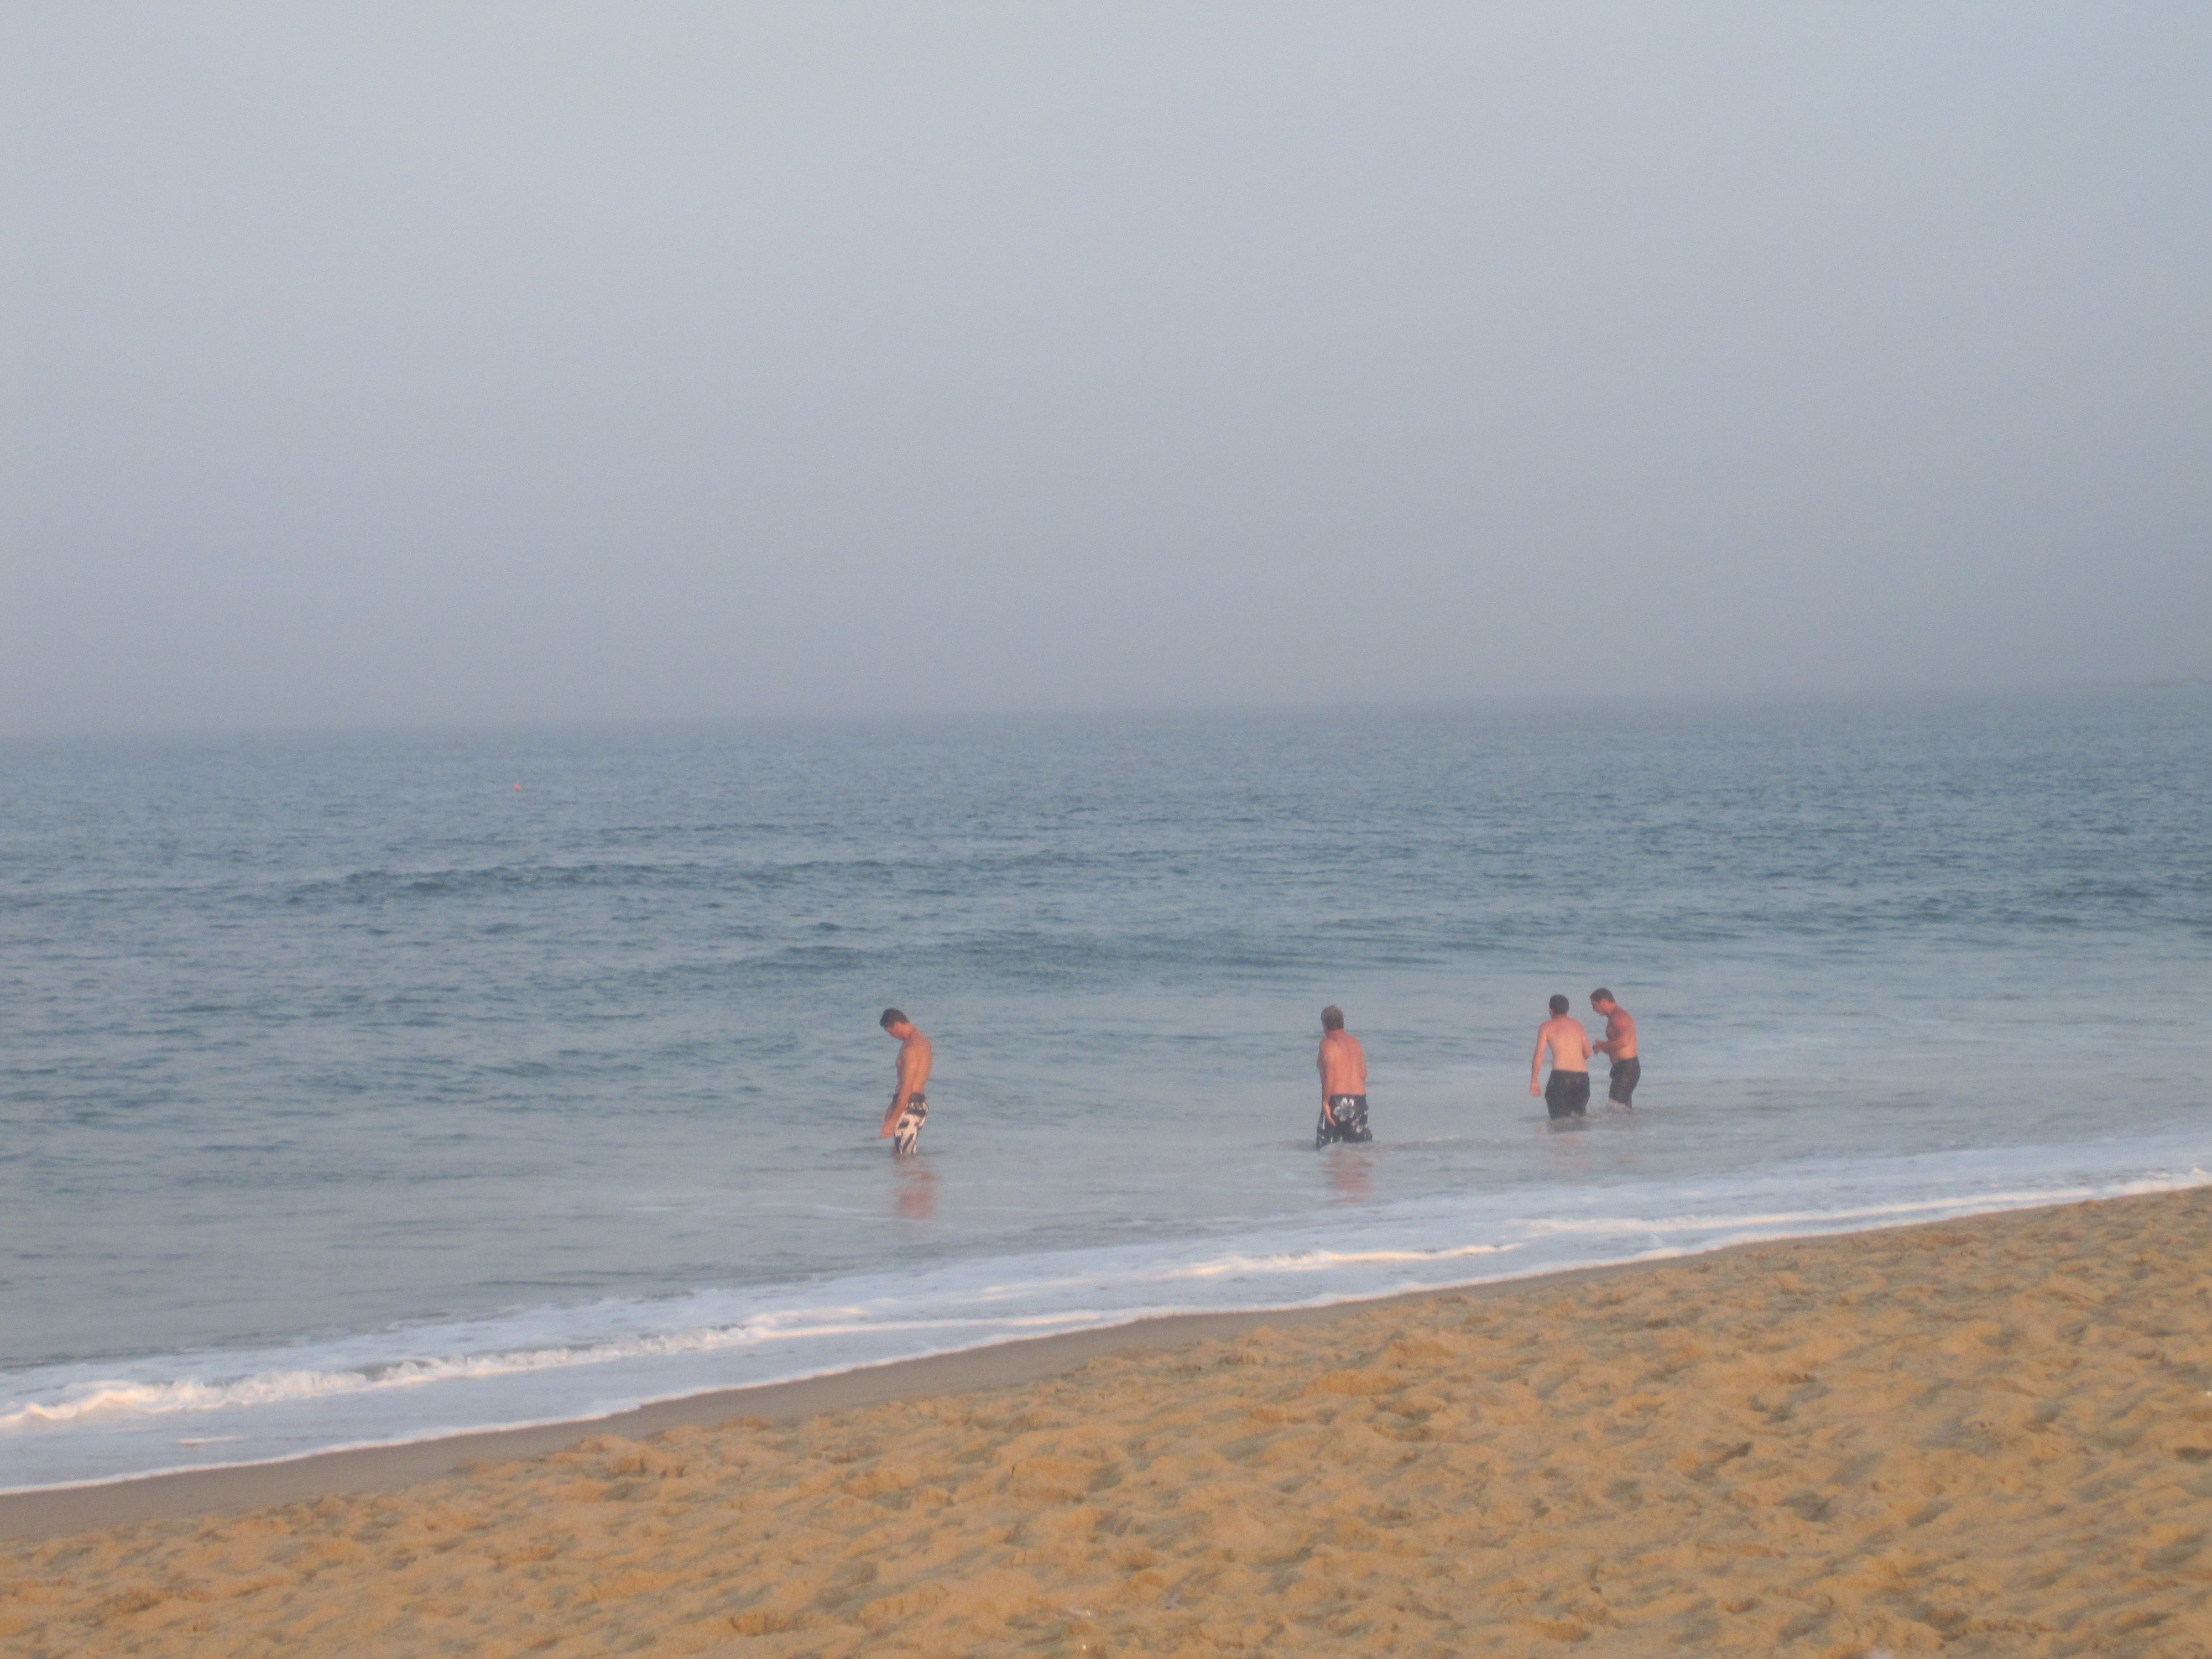 nude beaches rhode island